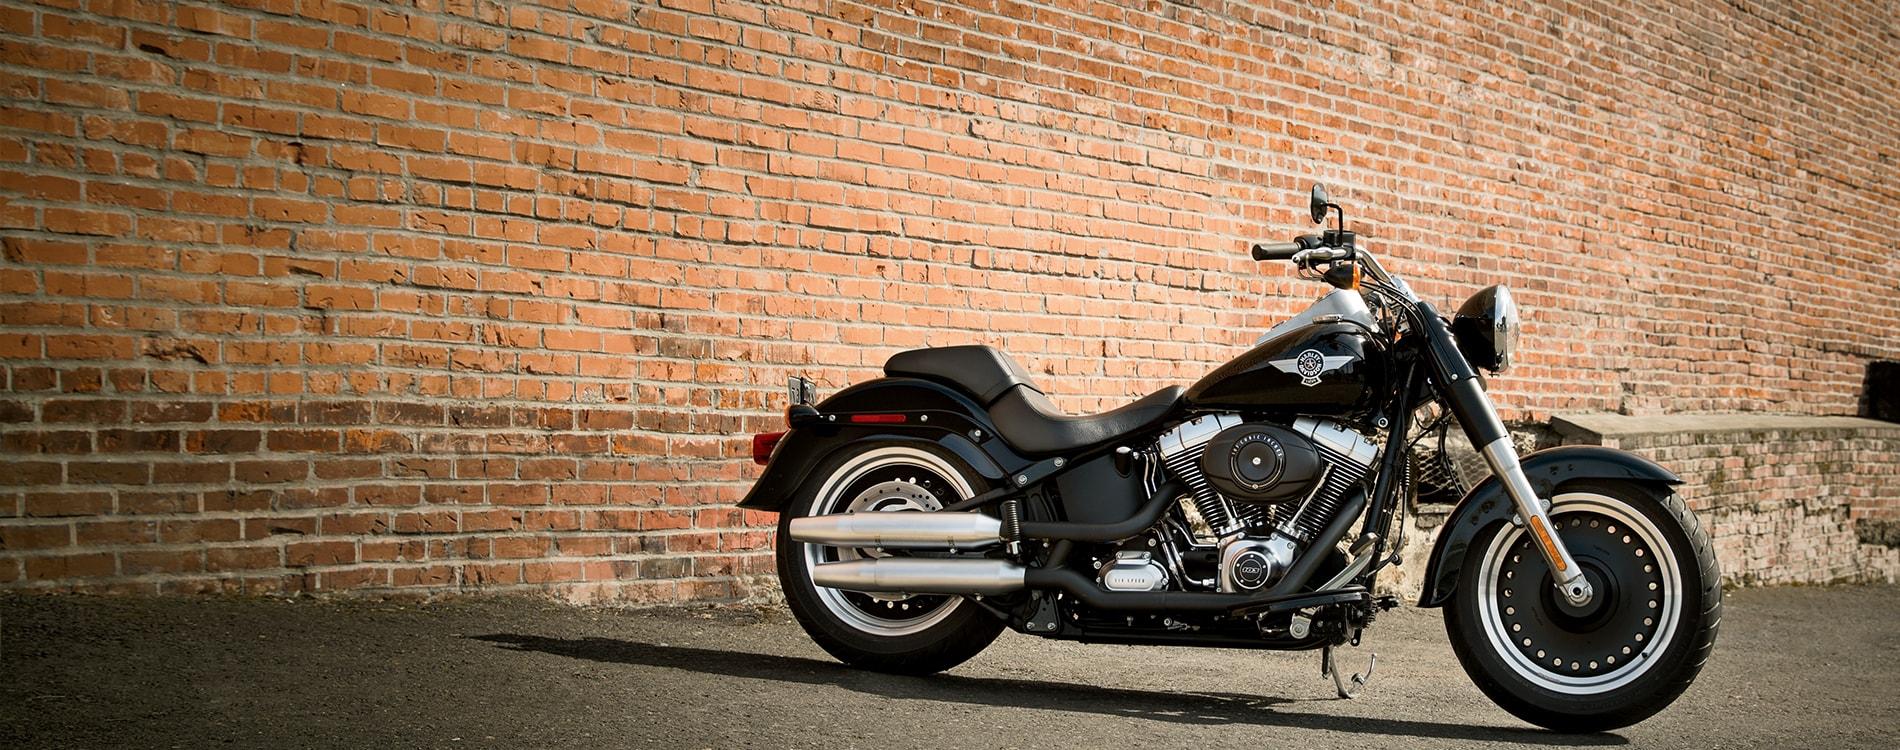 Black Wolf Harley Davidson Bristol Va Dealertshirts Black Wolf Harley Davidson Bristol Virginia